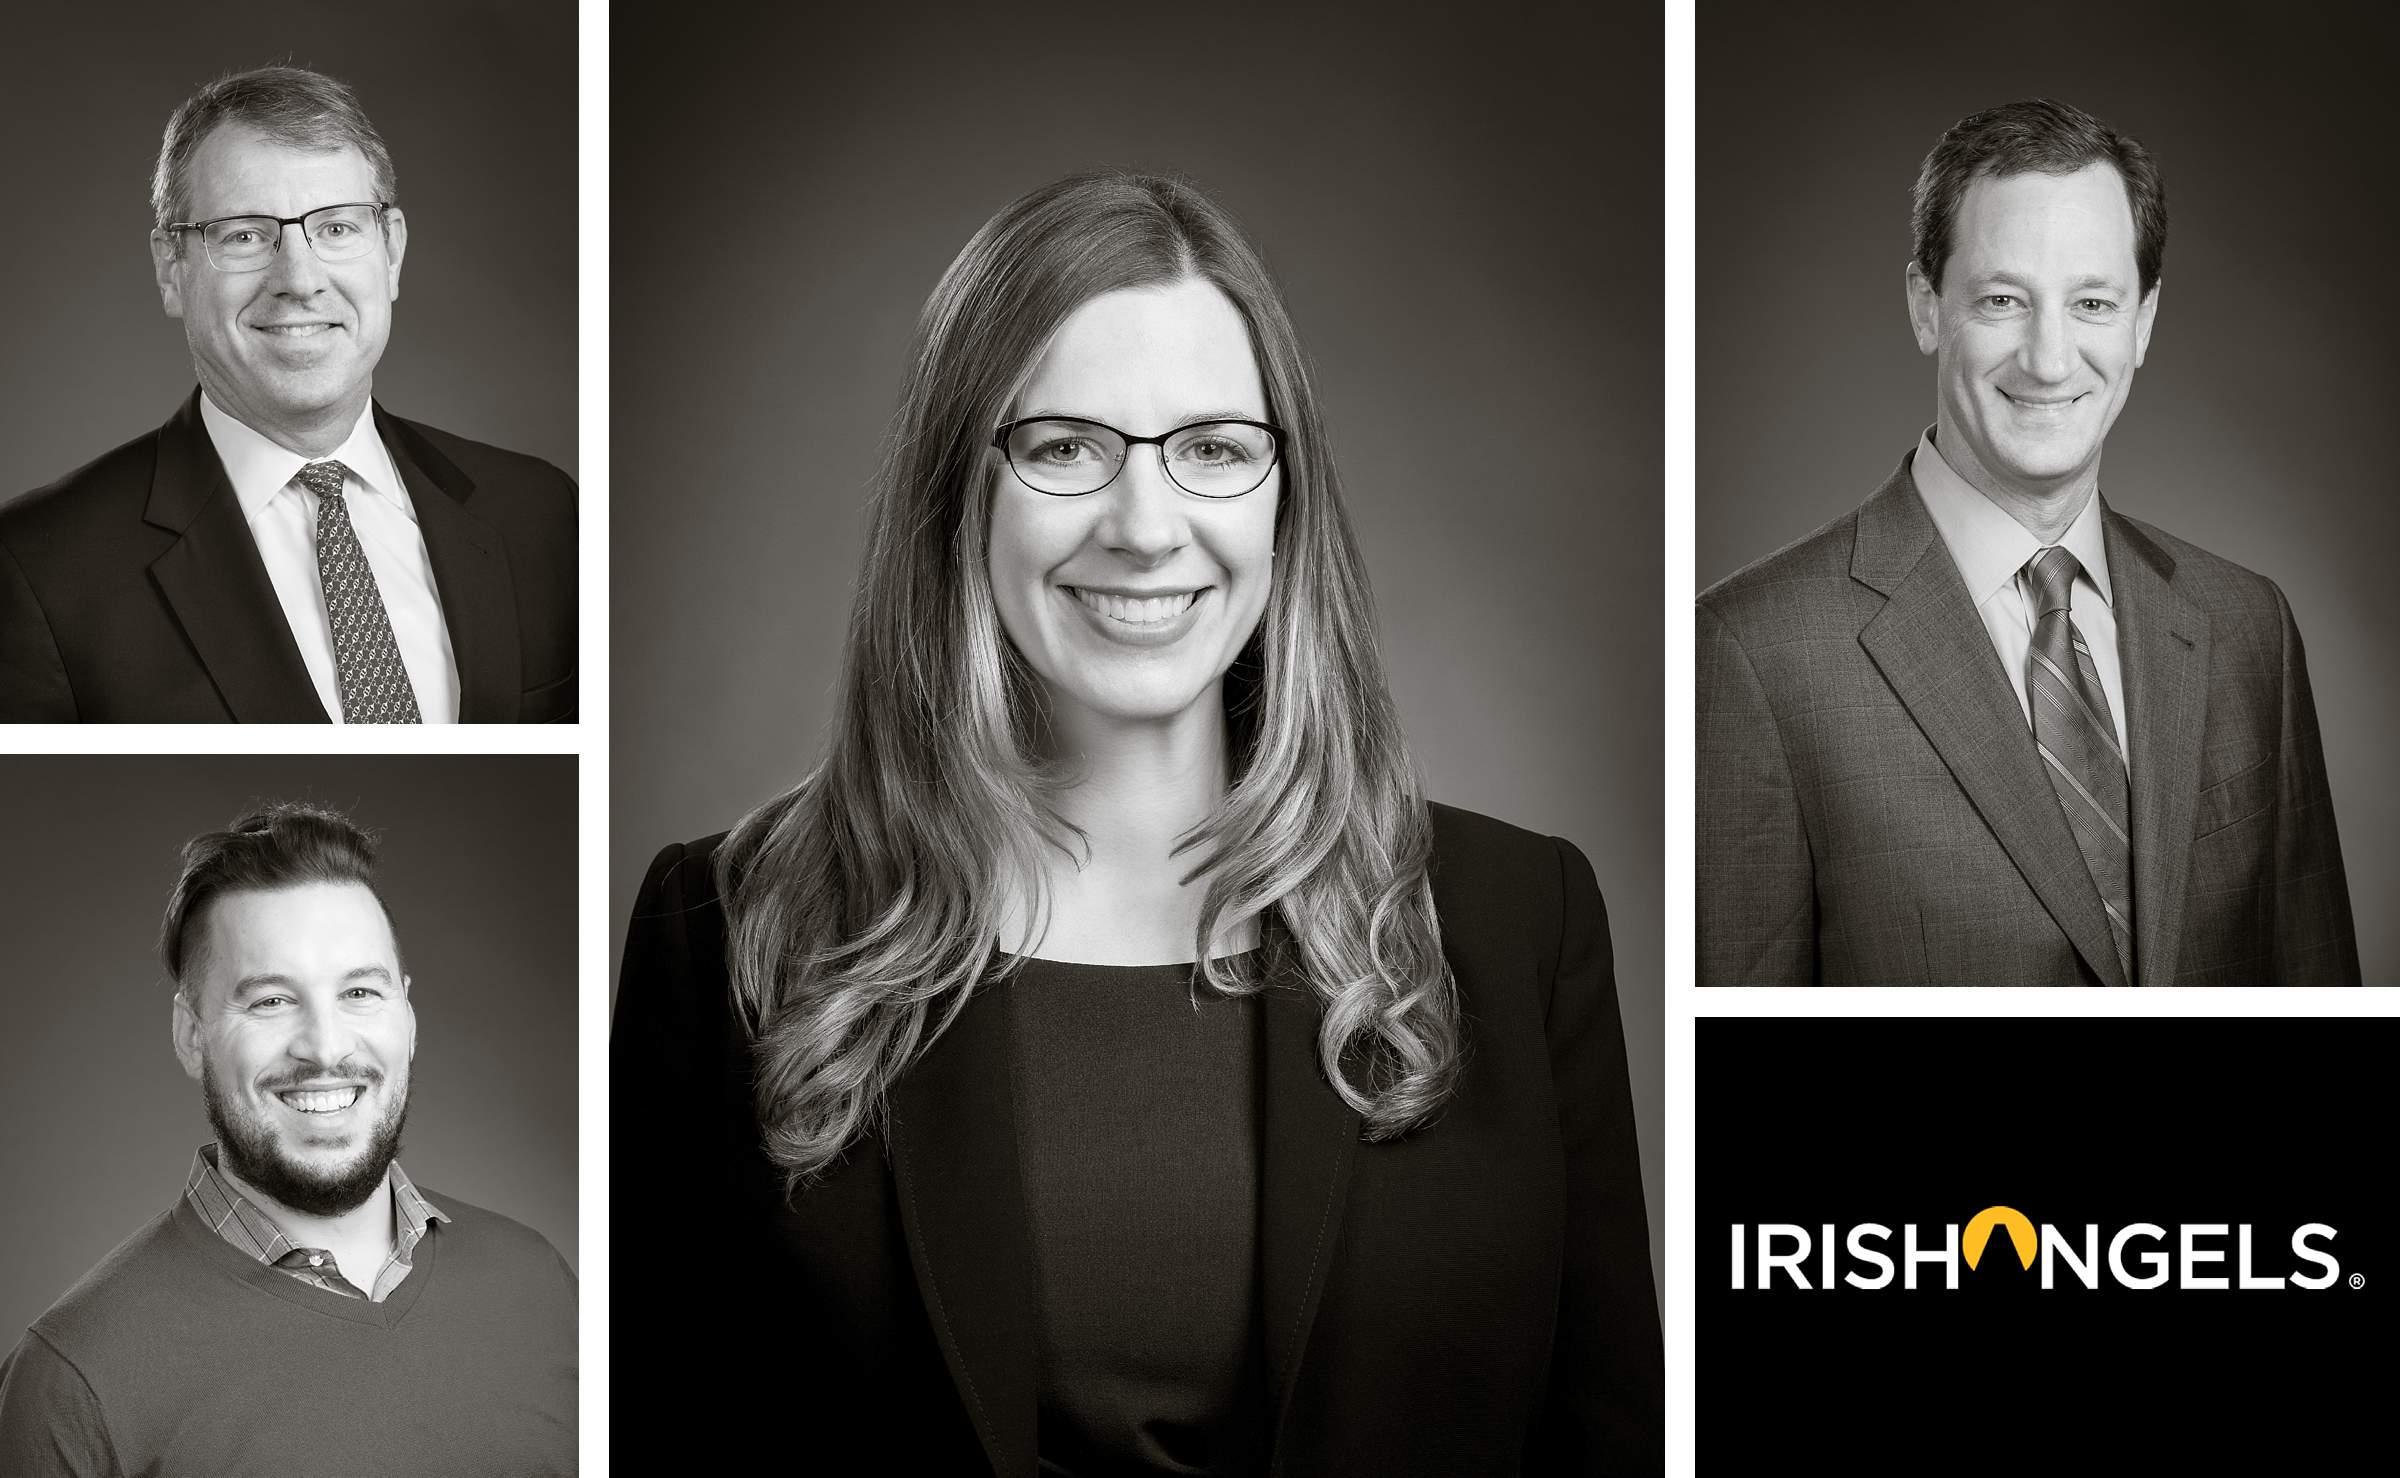 Black and white business headshot portrait for linkedin profile - Tom Schmidt Photogapher